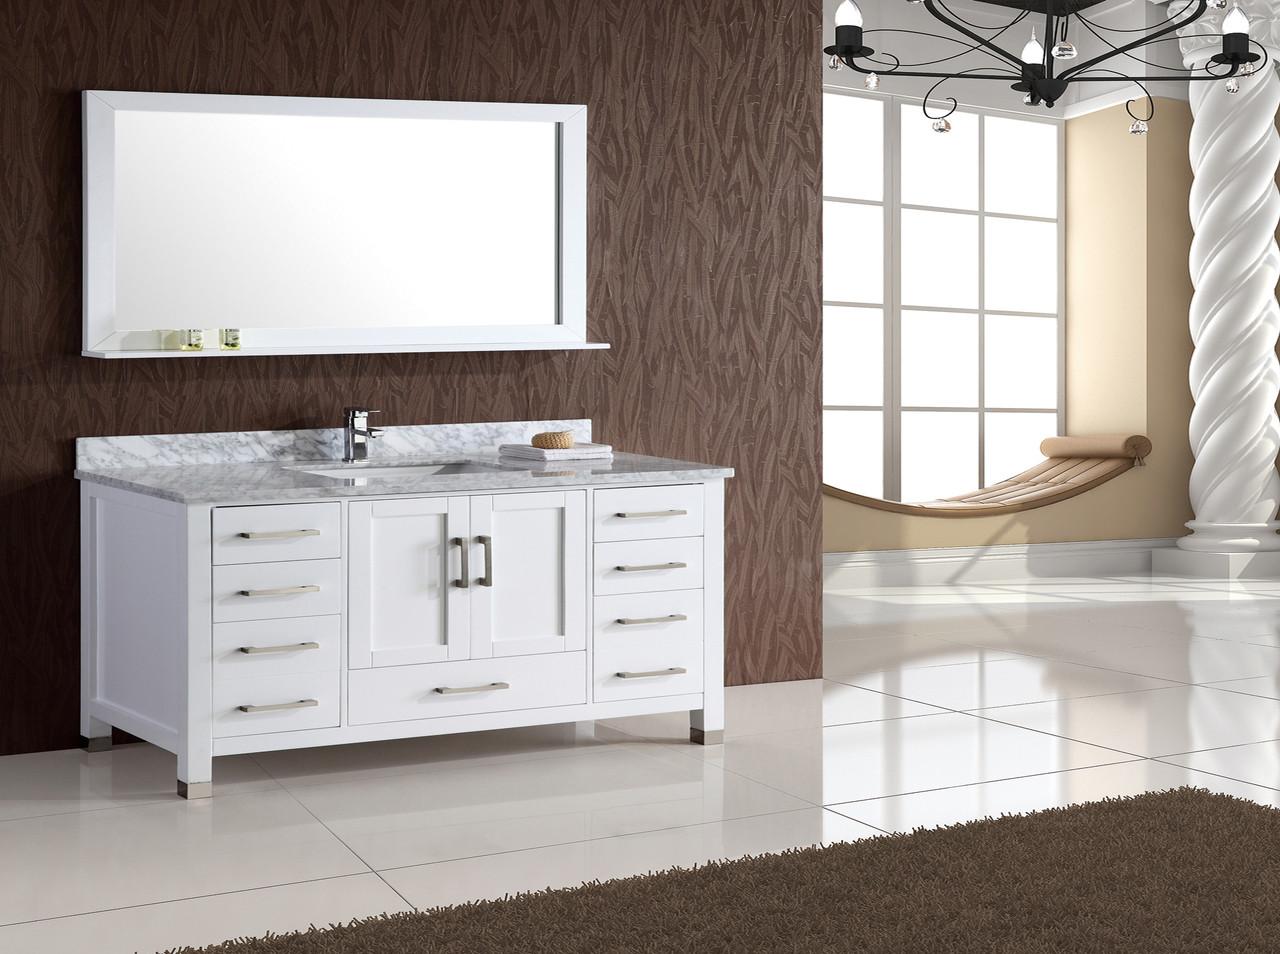 armada 55 white single sink bathroom vanity